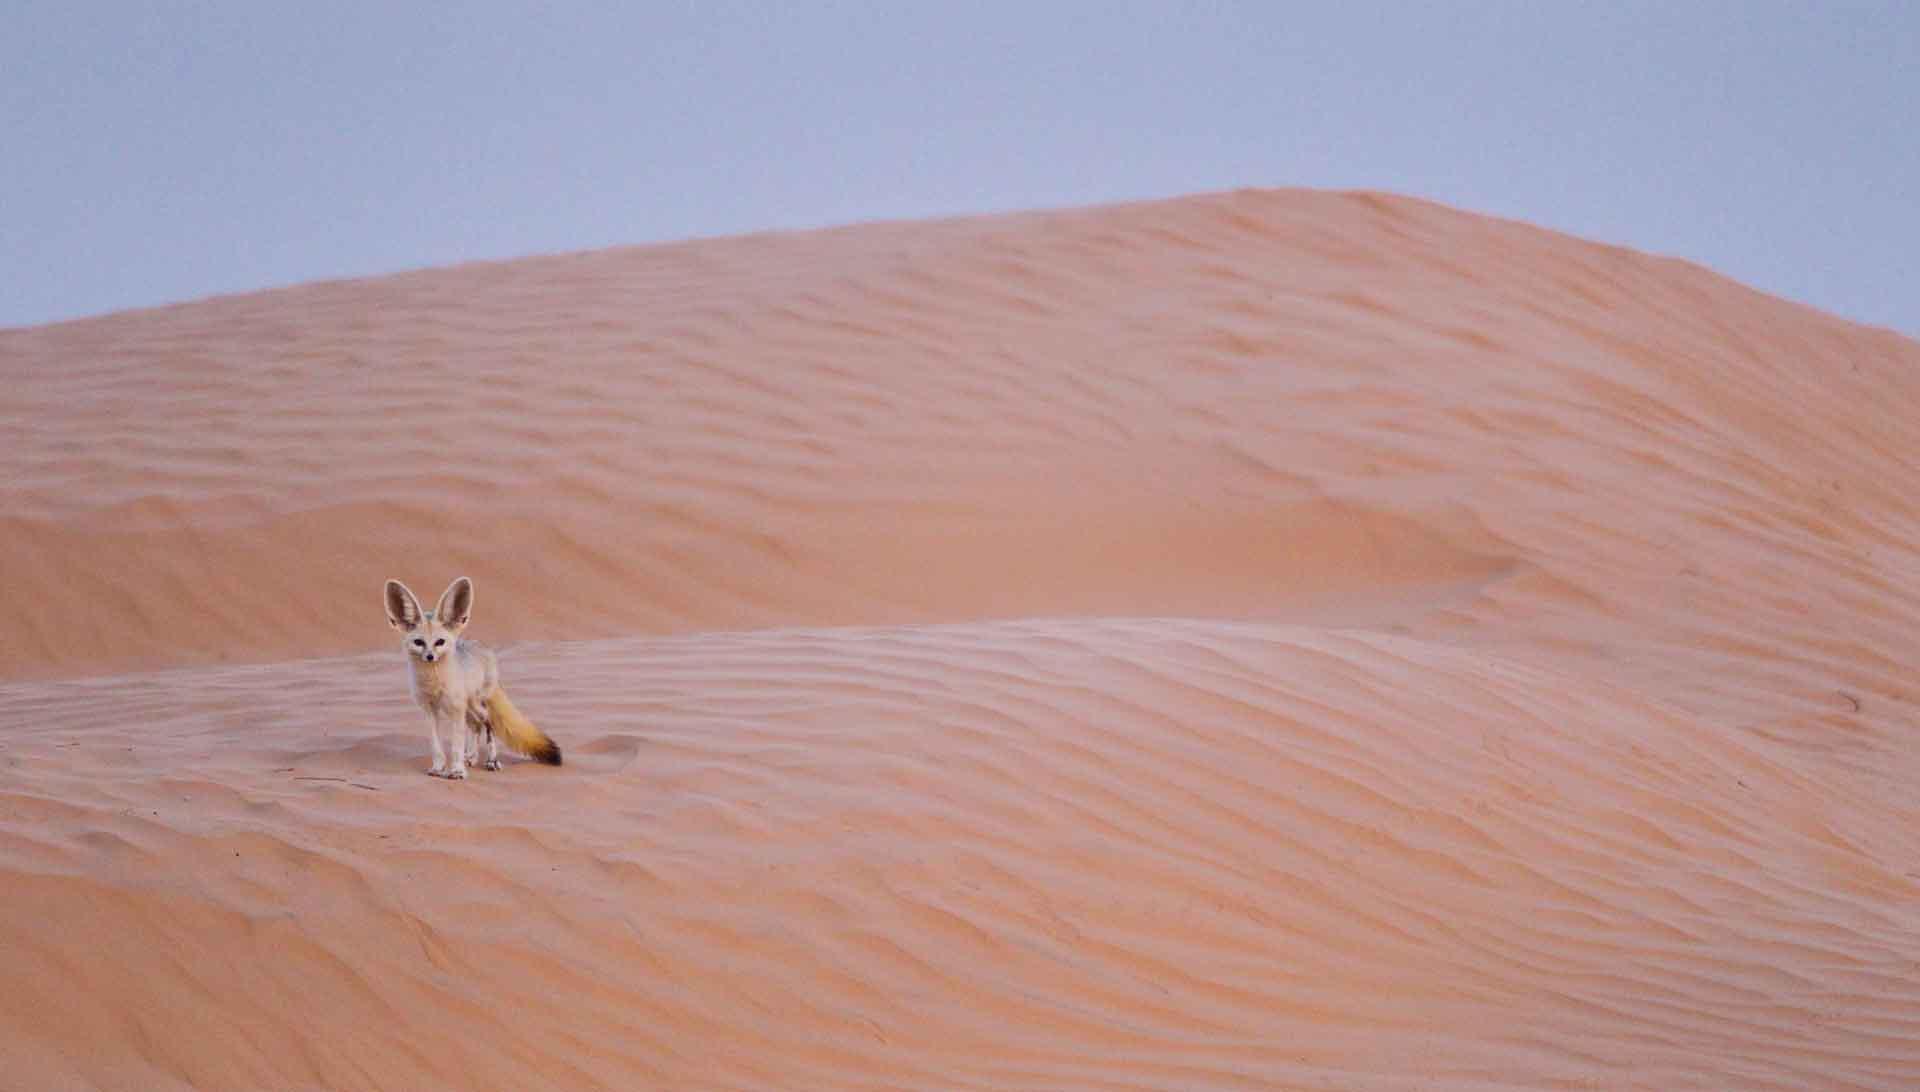 Животное фенек приспособлено к жаркому климату